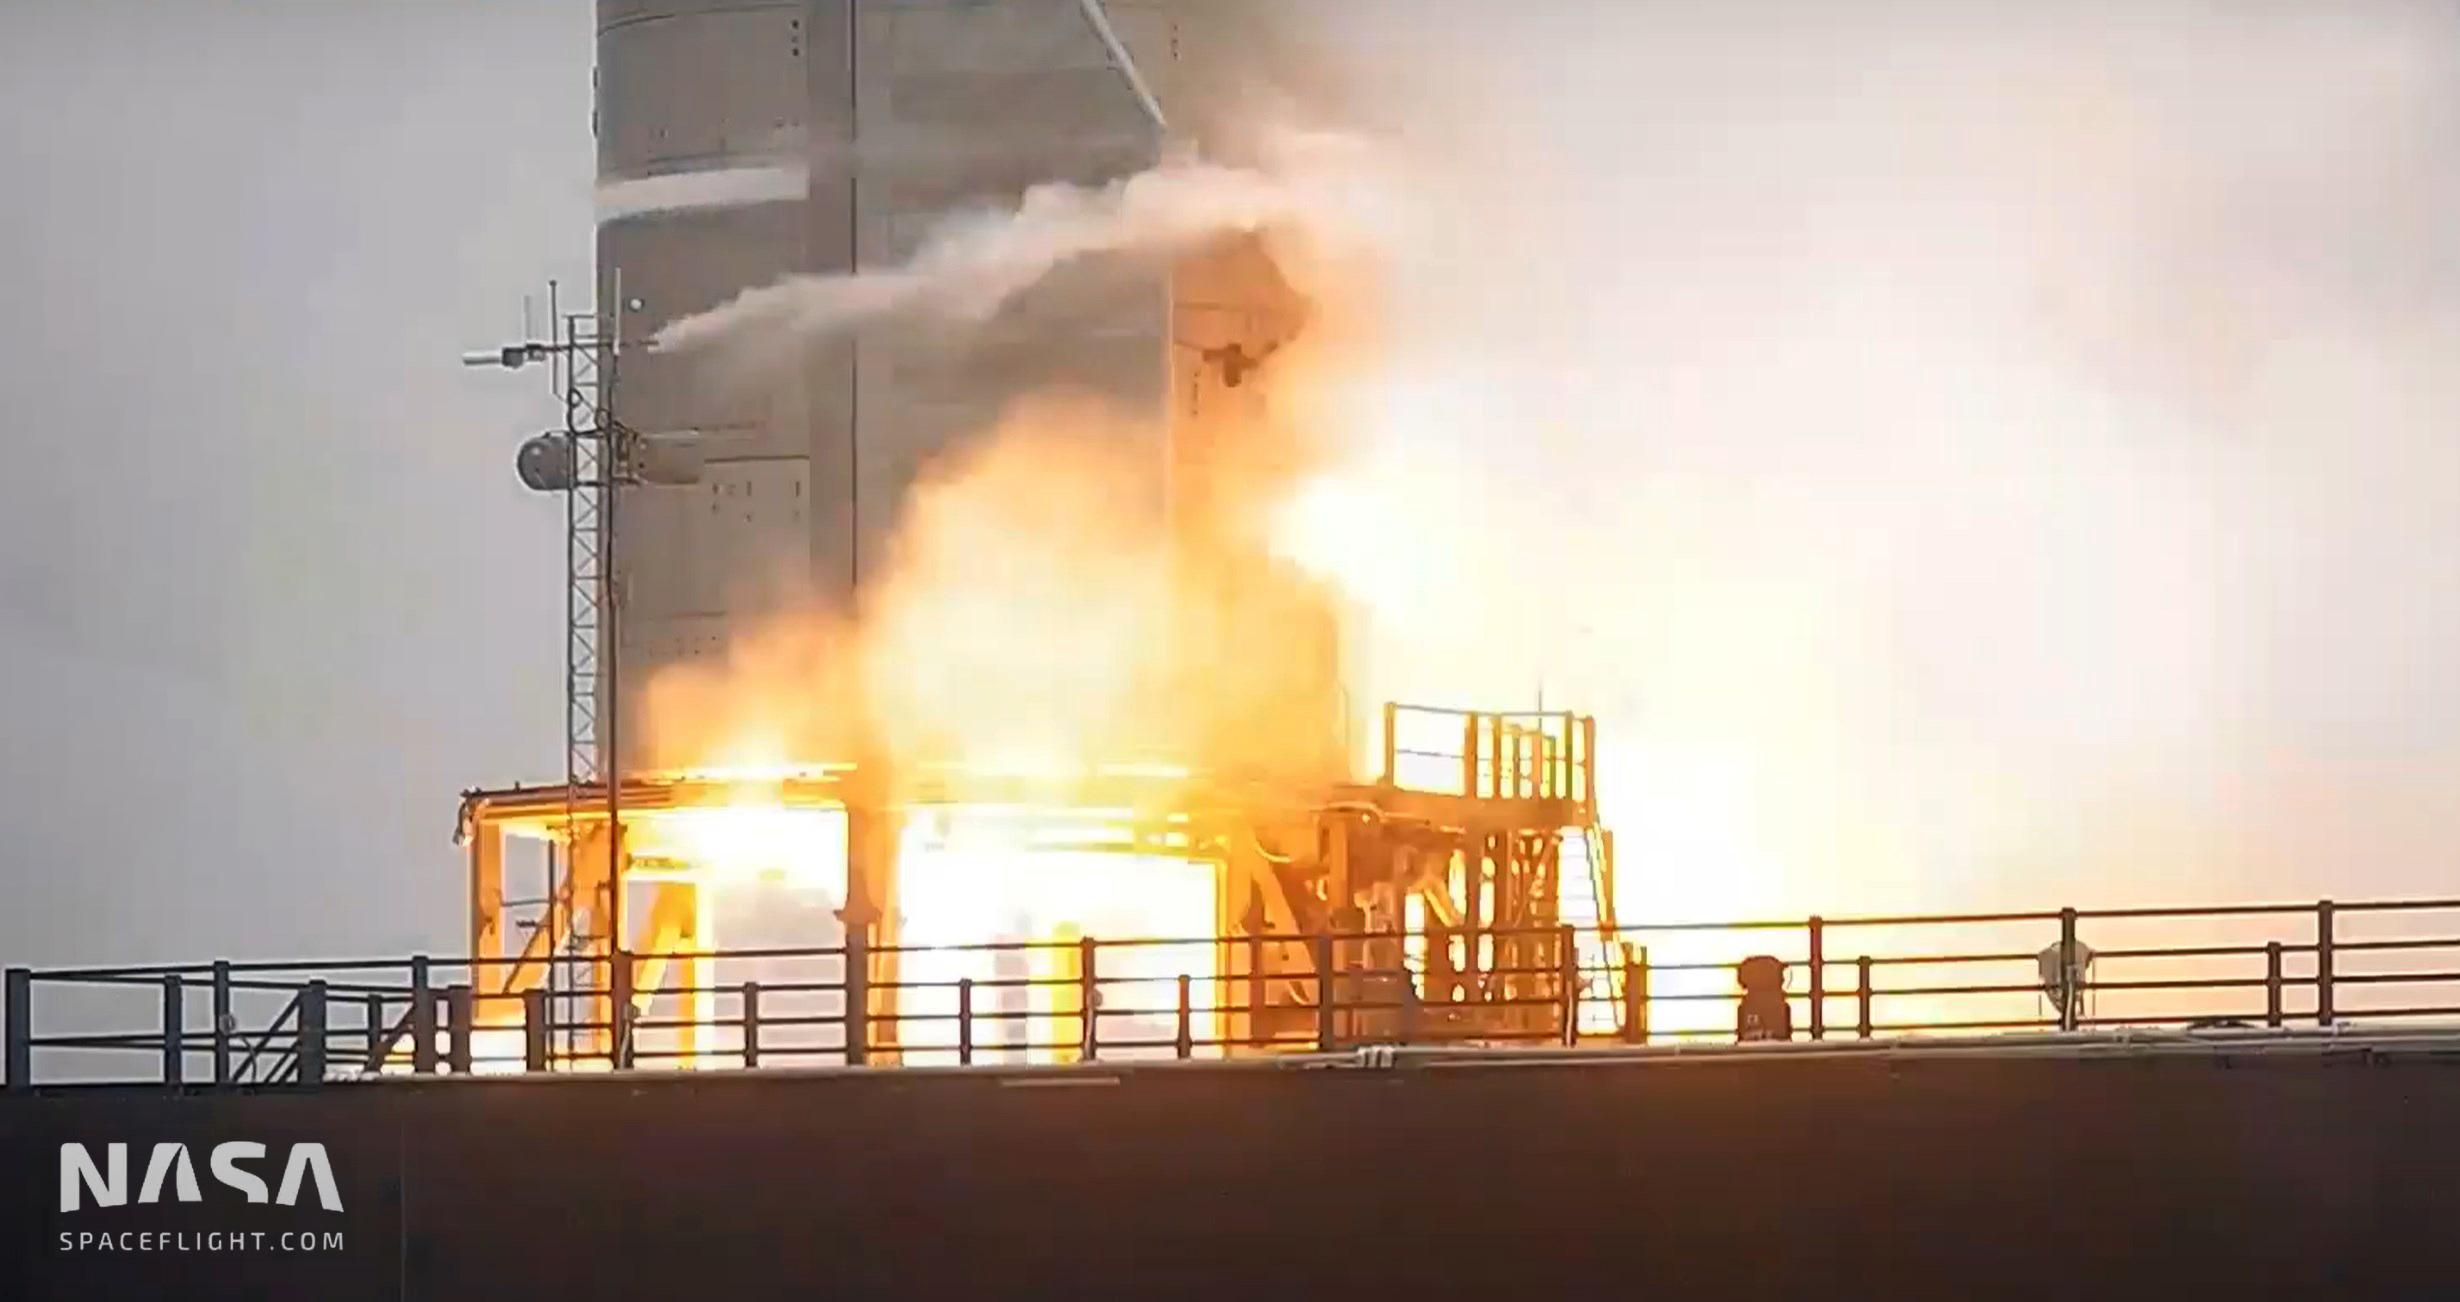 Starship Boca Chica 042721 (NASASpaceflight) SN15 static fire #2 3 edit